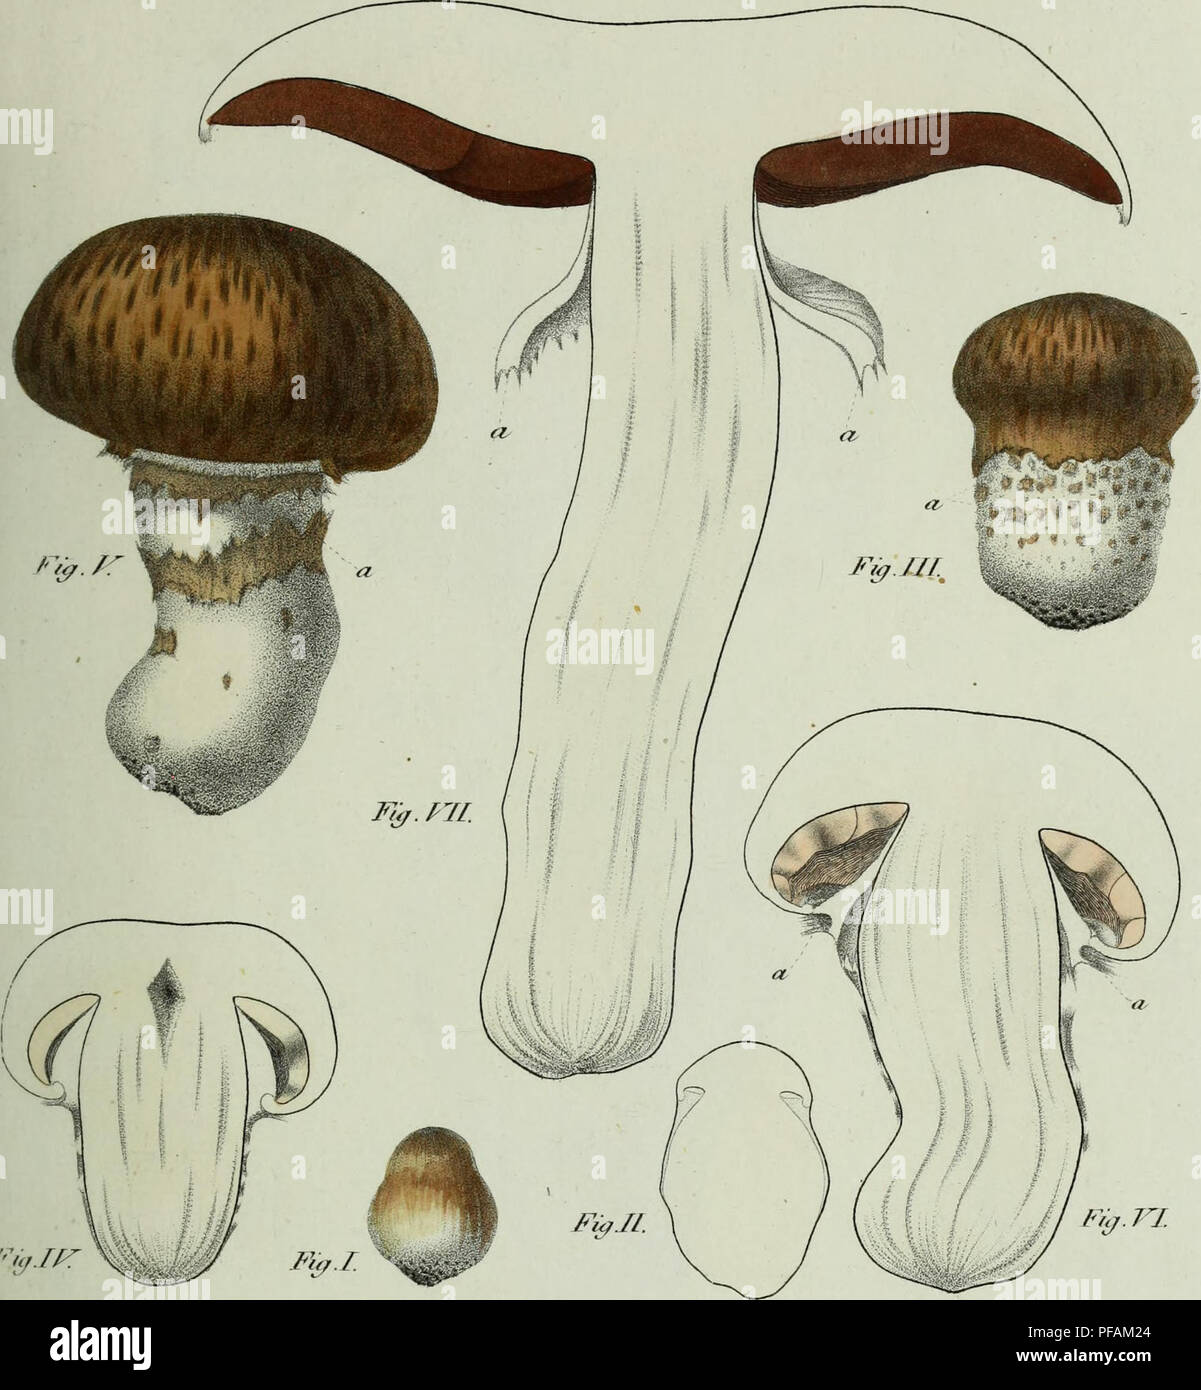 ". Descrizione dei funghi mangerecci più comuni dell'Italia e de' velenosi che possono co' medesimi confondersi. Fungi; Mushrooms. / â -££ T.17/Z. '""'. 7- m- <r.r nalufa. Please note that these images are extracted from scanned page images that may have been digitally enhanced for readability - coloration and appearance of these illustrations may not perfectly resemble the original work.. Vittadini, Carlo; Cavagna Sangiuliani di Gualdana, Antonio, conte, 1843-1913, former owner. IU-R. Milano, Rusconi - Stock Image"